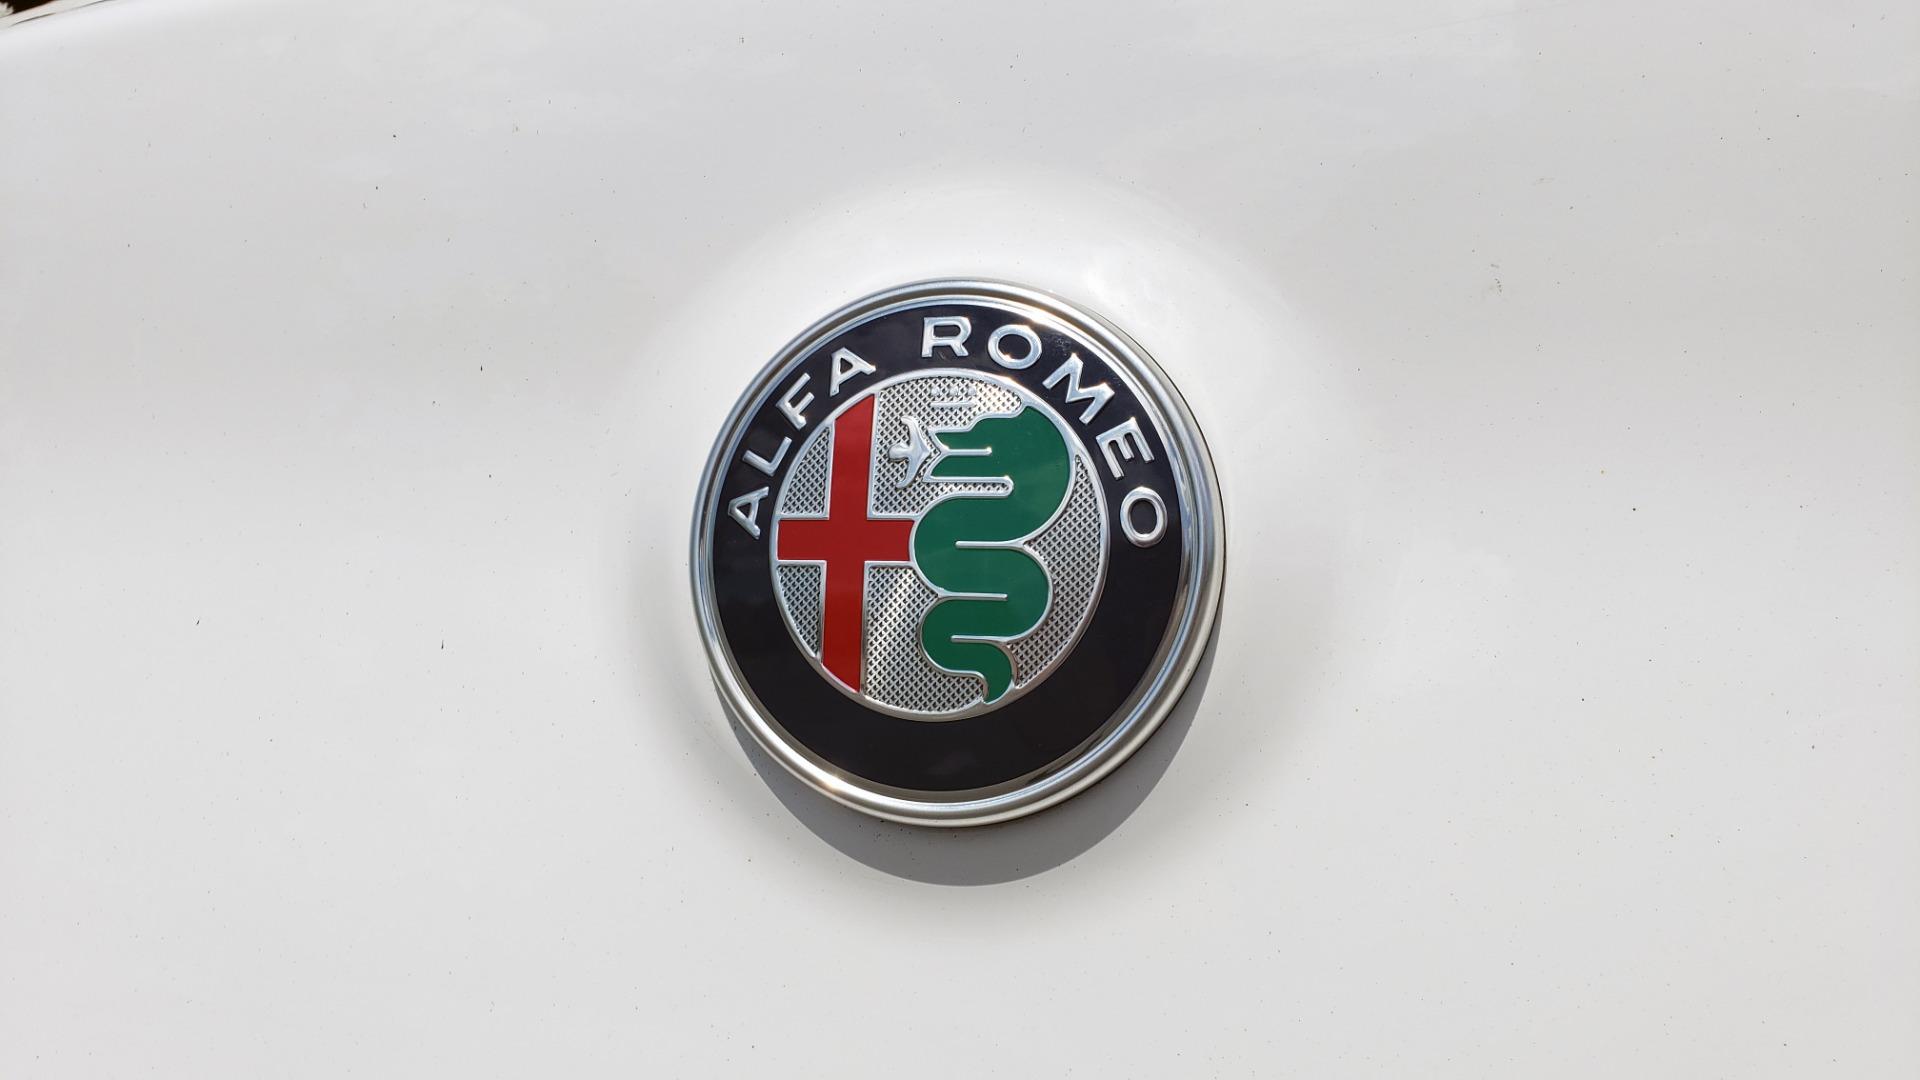 Used 2019 Alfa Romeo STELVIO TI SPORT AWD / 2.0L TURBO / 8-SPD AUTO / DRVR ASST / REARVIEW for sale $37,495 at Formula Imports in Charlotte NC 28227 35